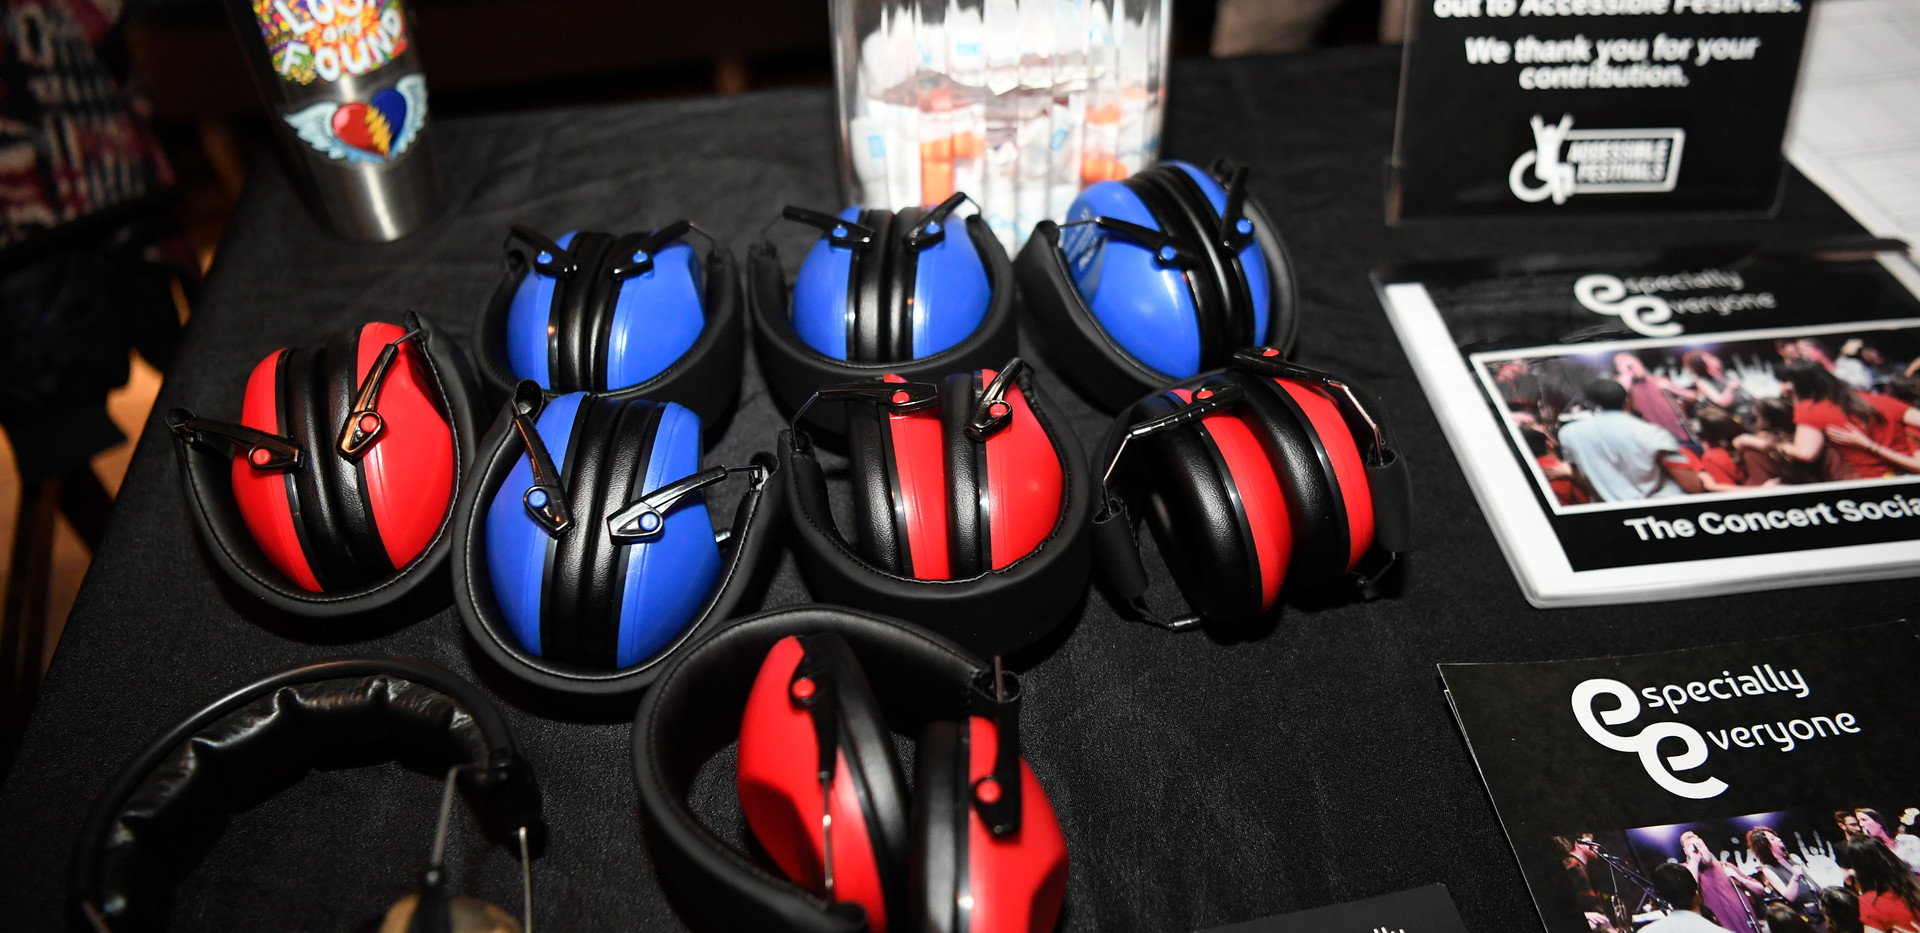 Headphones - 020920 copy.JPG